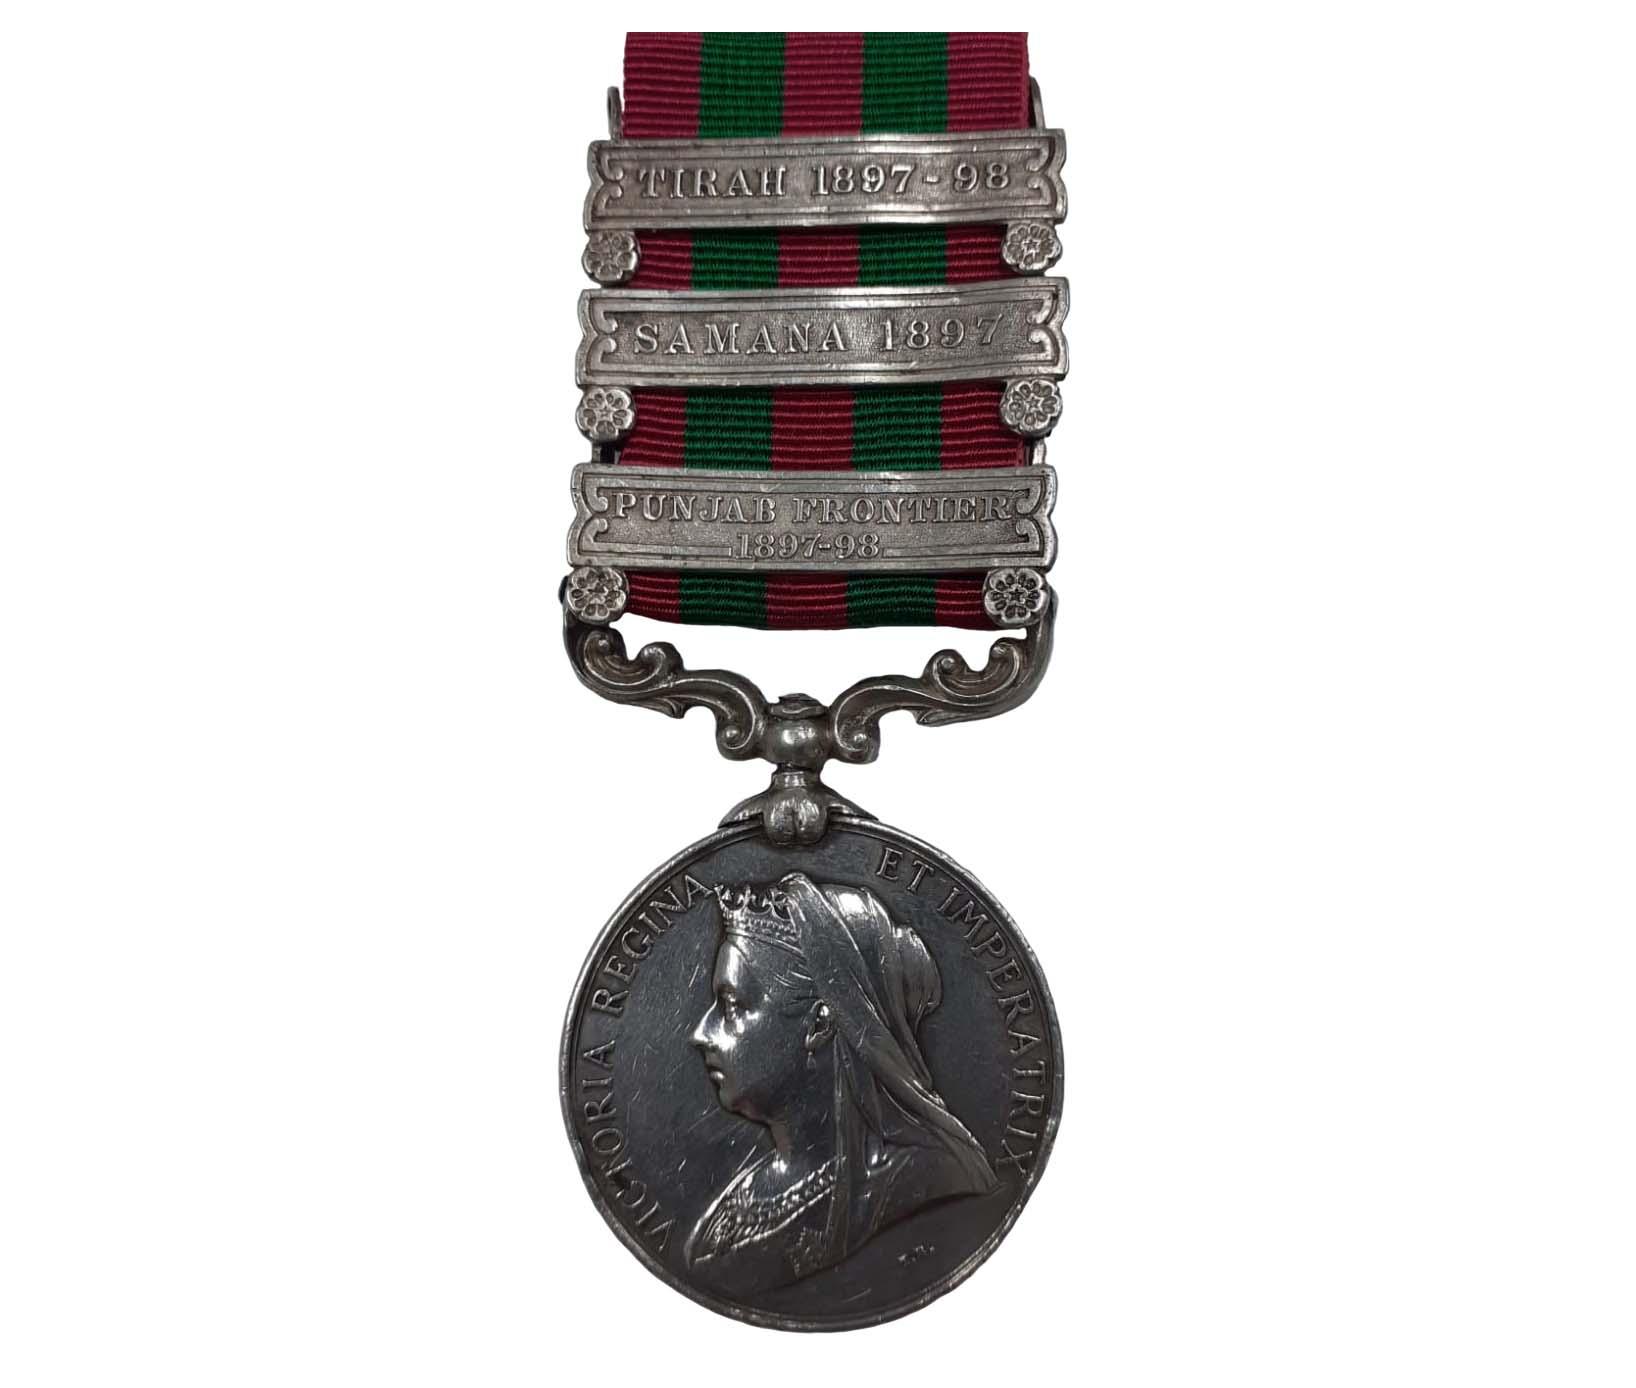 India Medal 1895-1902, QVR to Driver Aktara